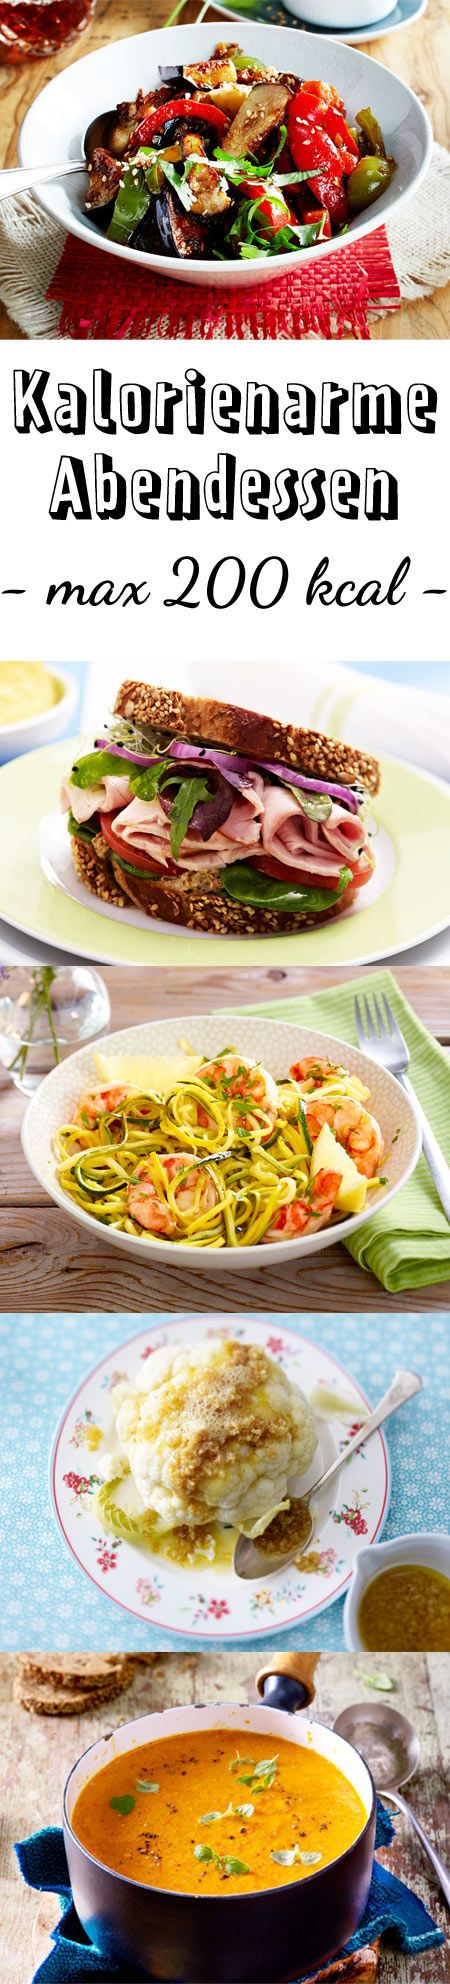 Kalorienarme Abendessen Mit Maximal 200 Kcal Diat Pinterest